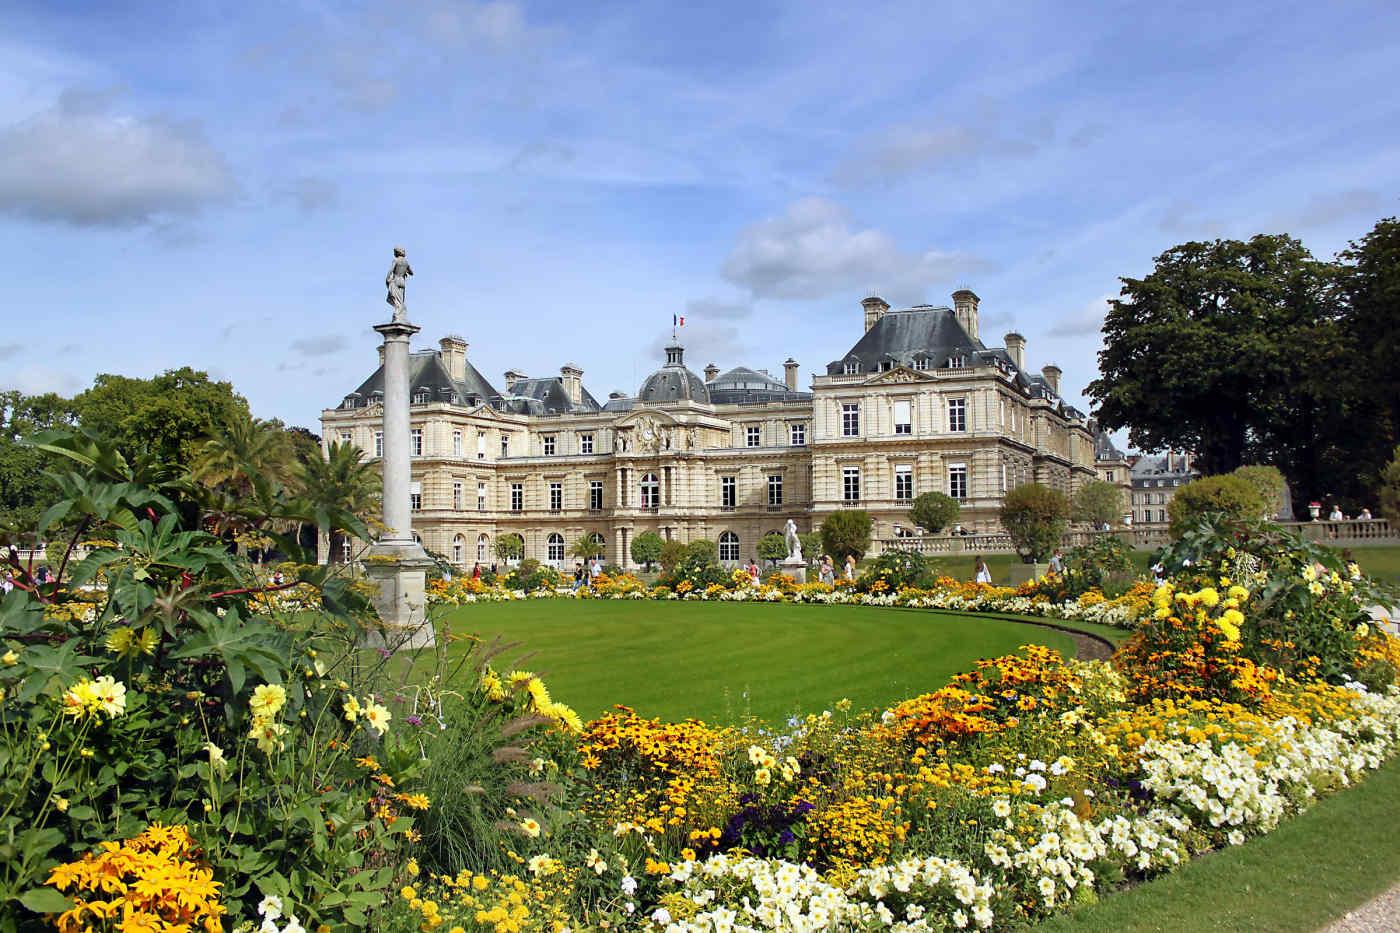 Luxembourg Palace